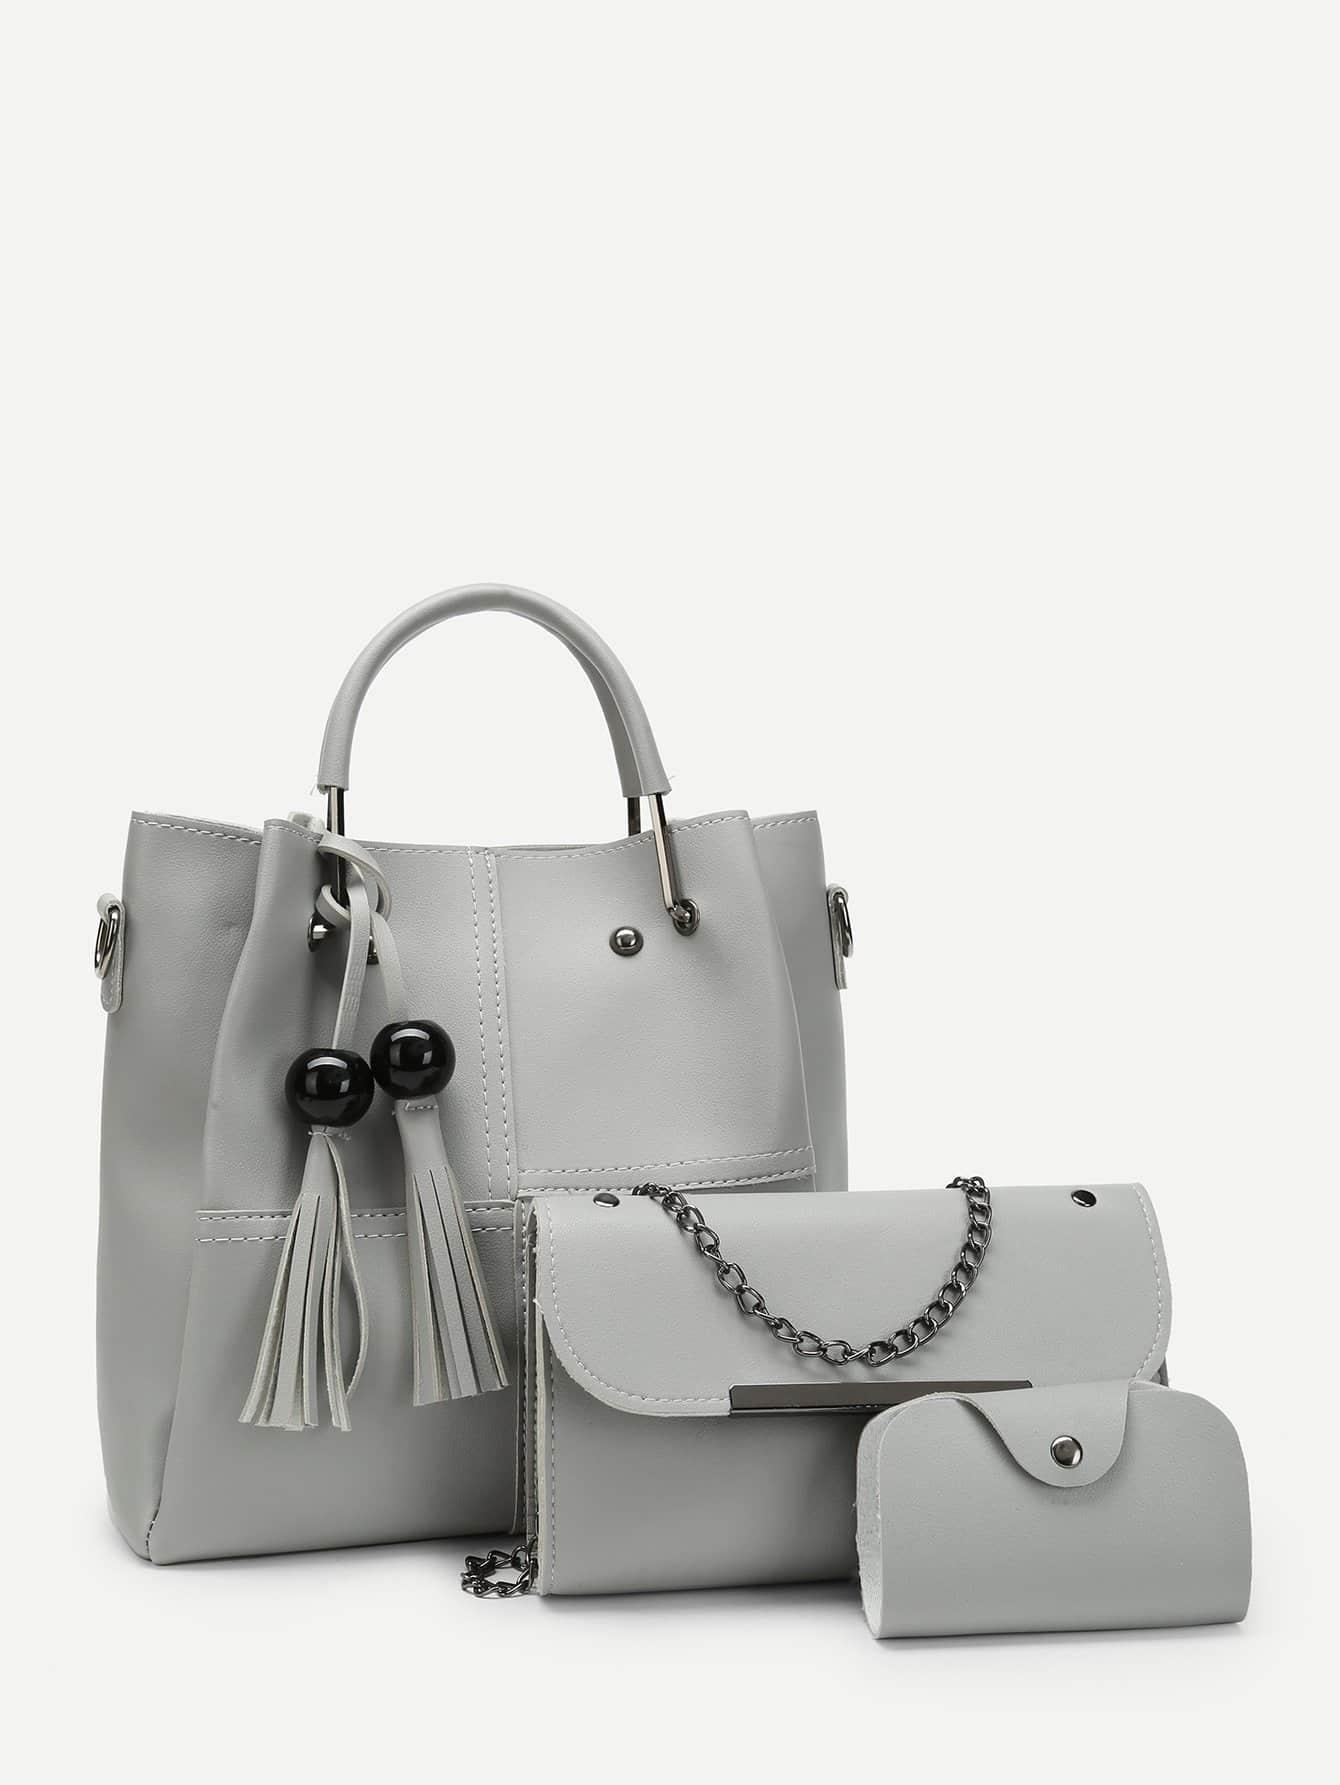 Tassel Charm Tote Bag 3pcs tote bag with round charm